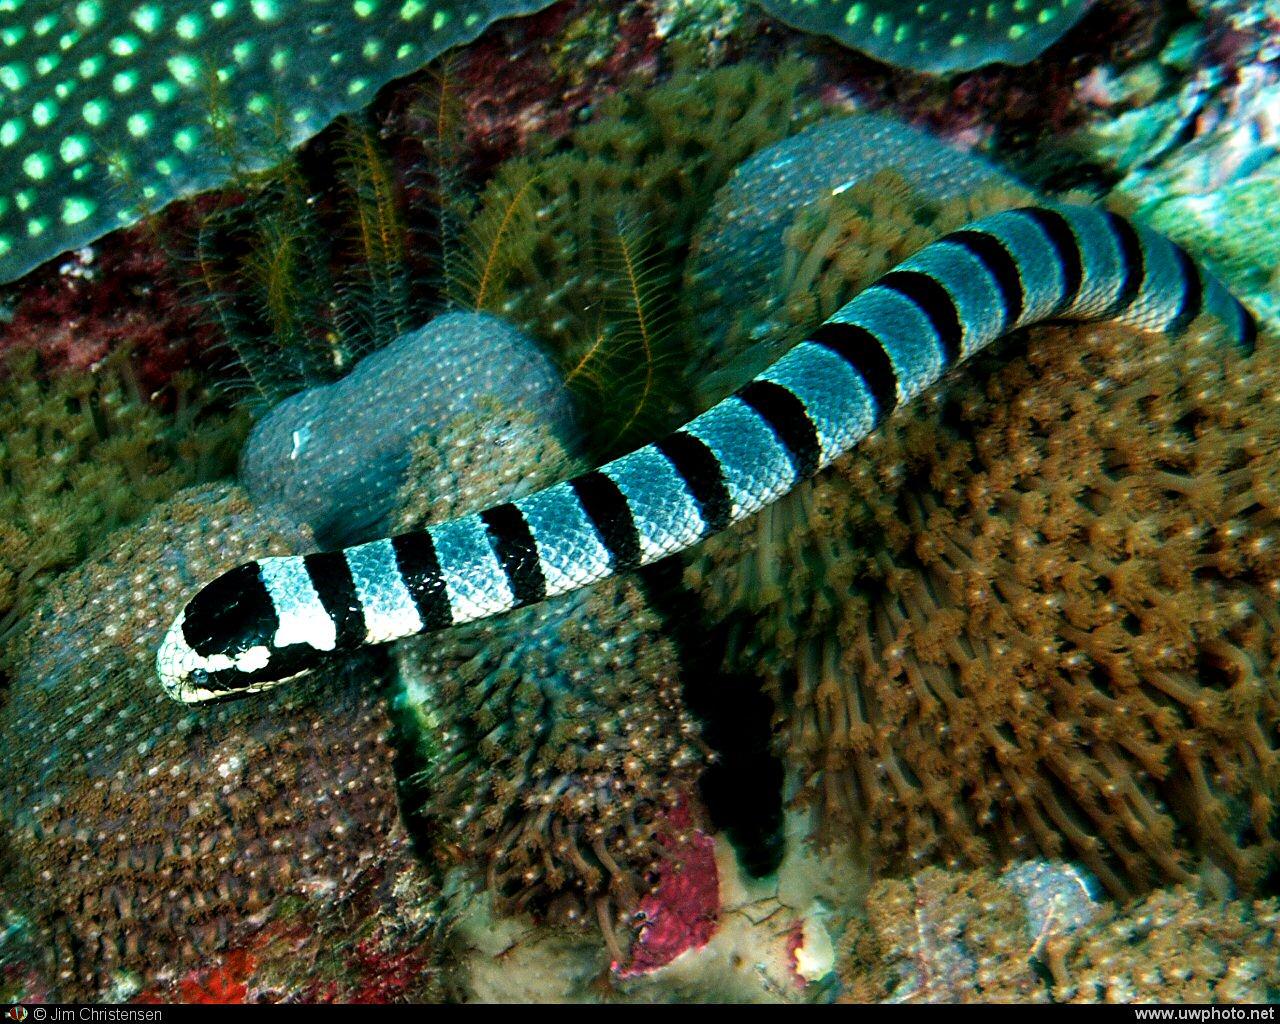 Giant underwater snake - photo#9